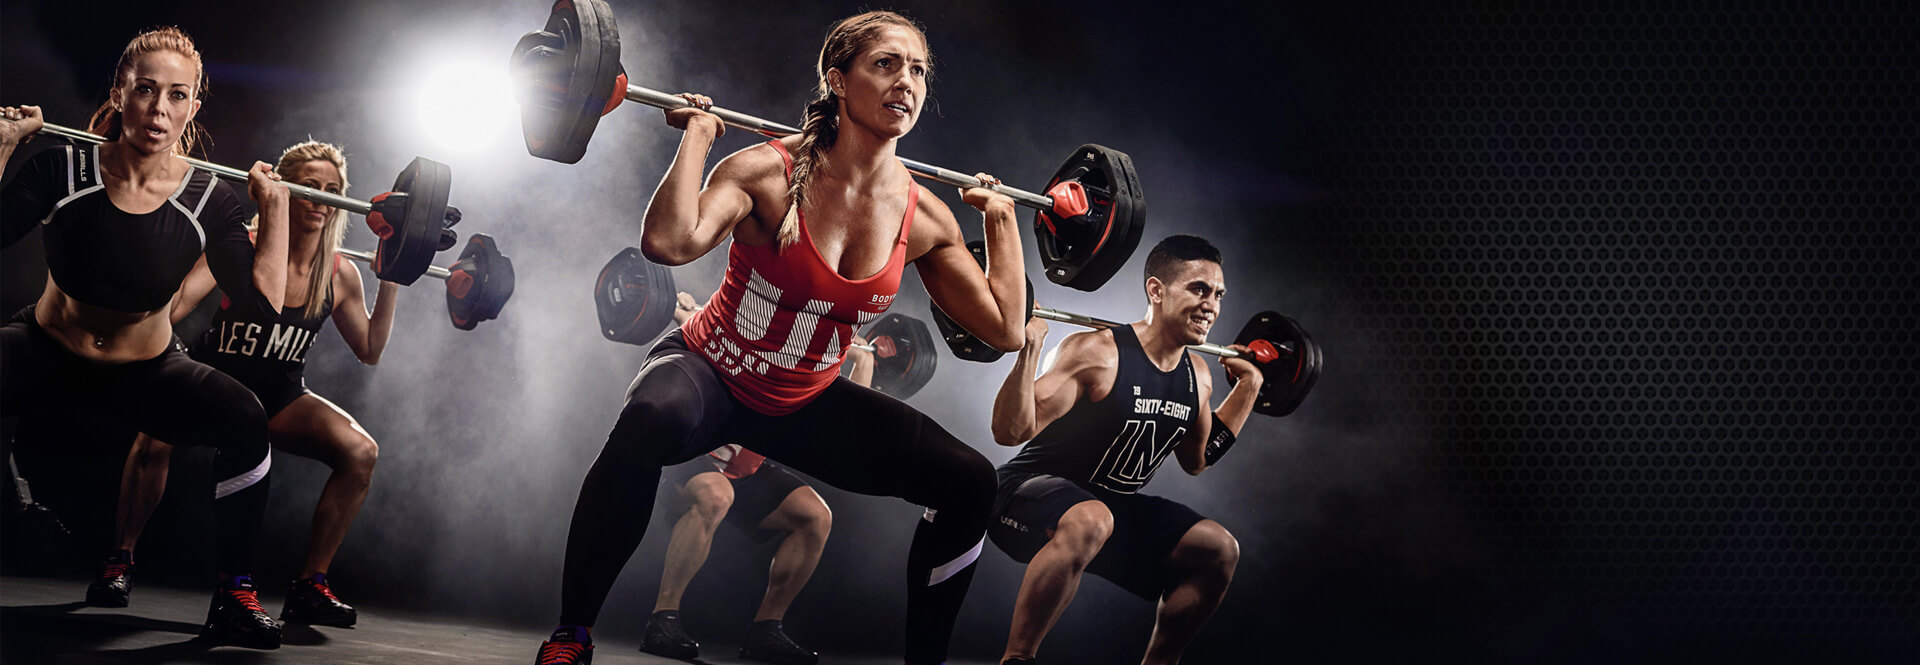 salle-sport-club-fitness-95-XLFIT-sldr1